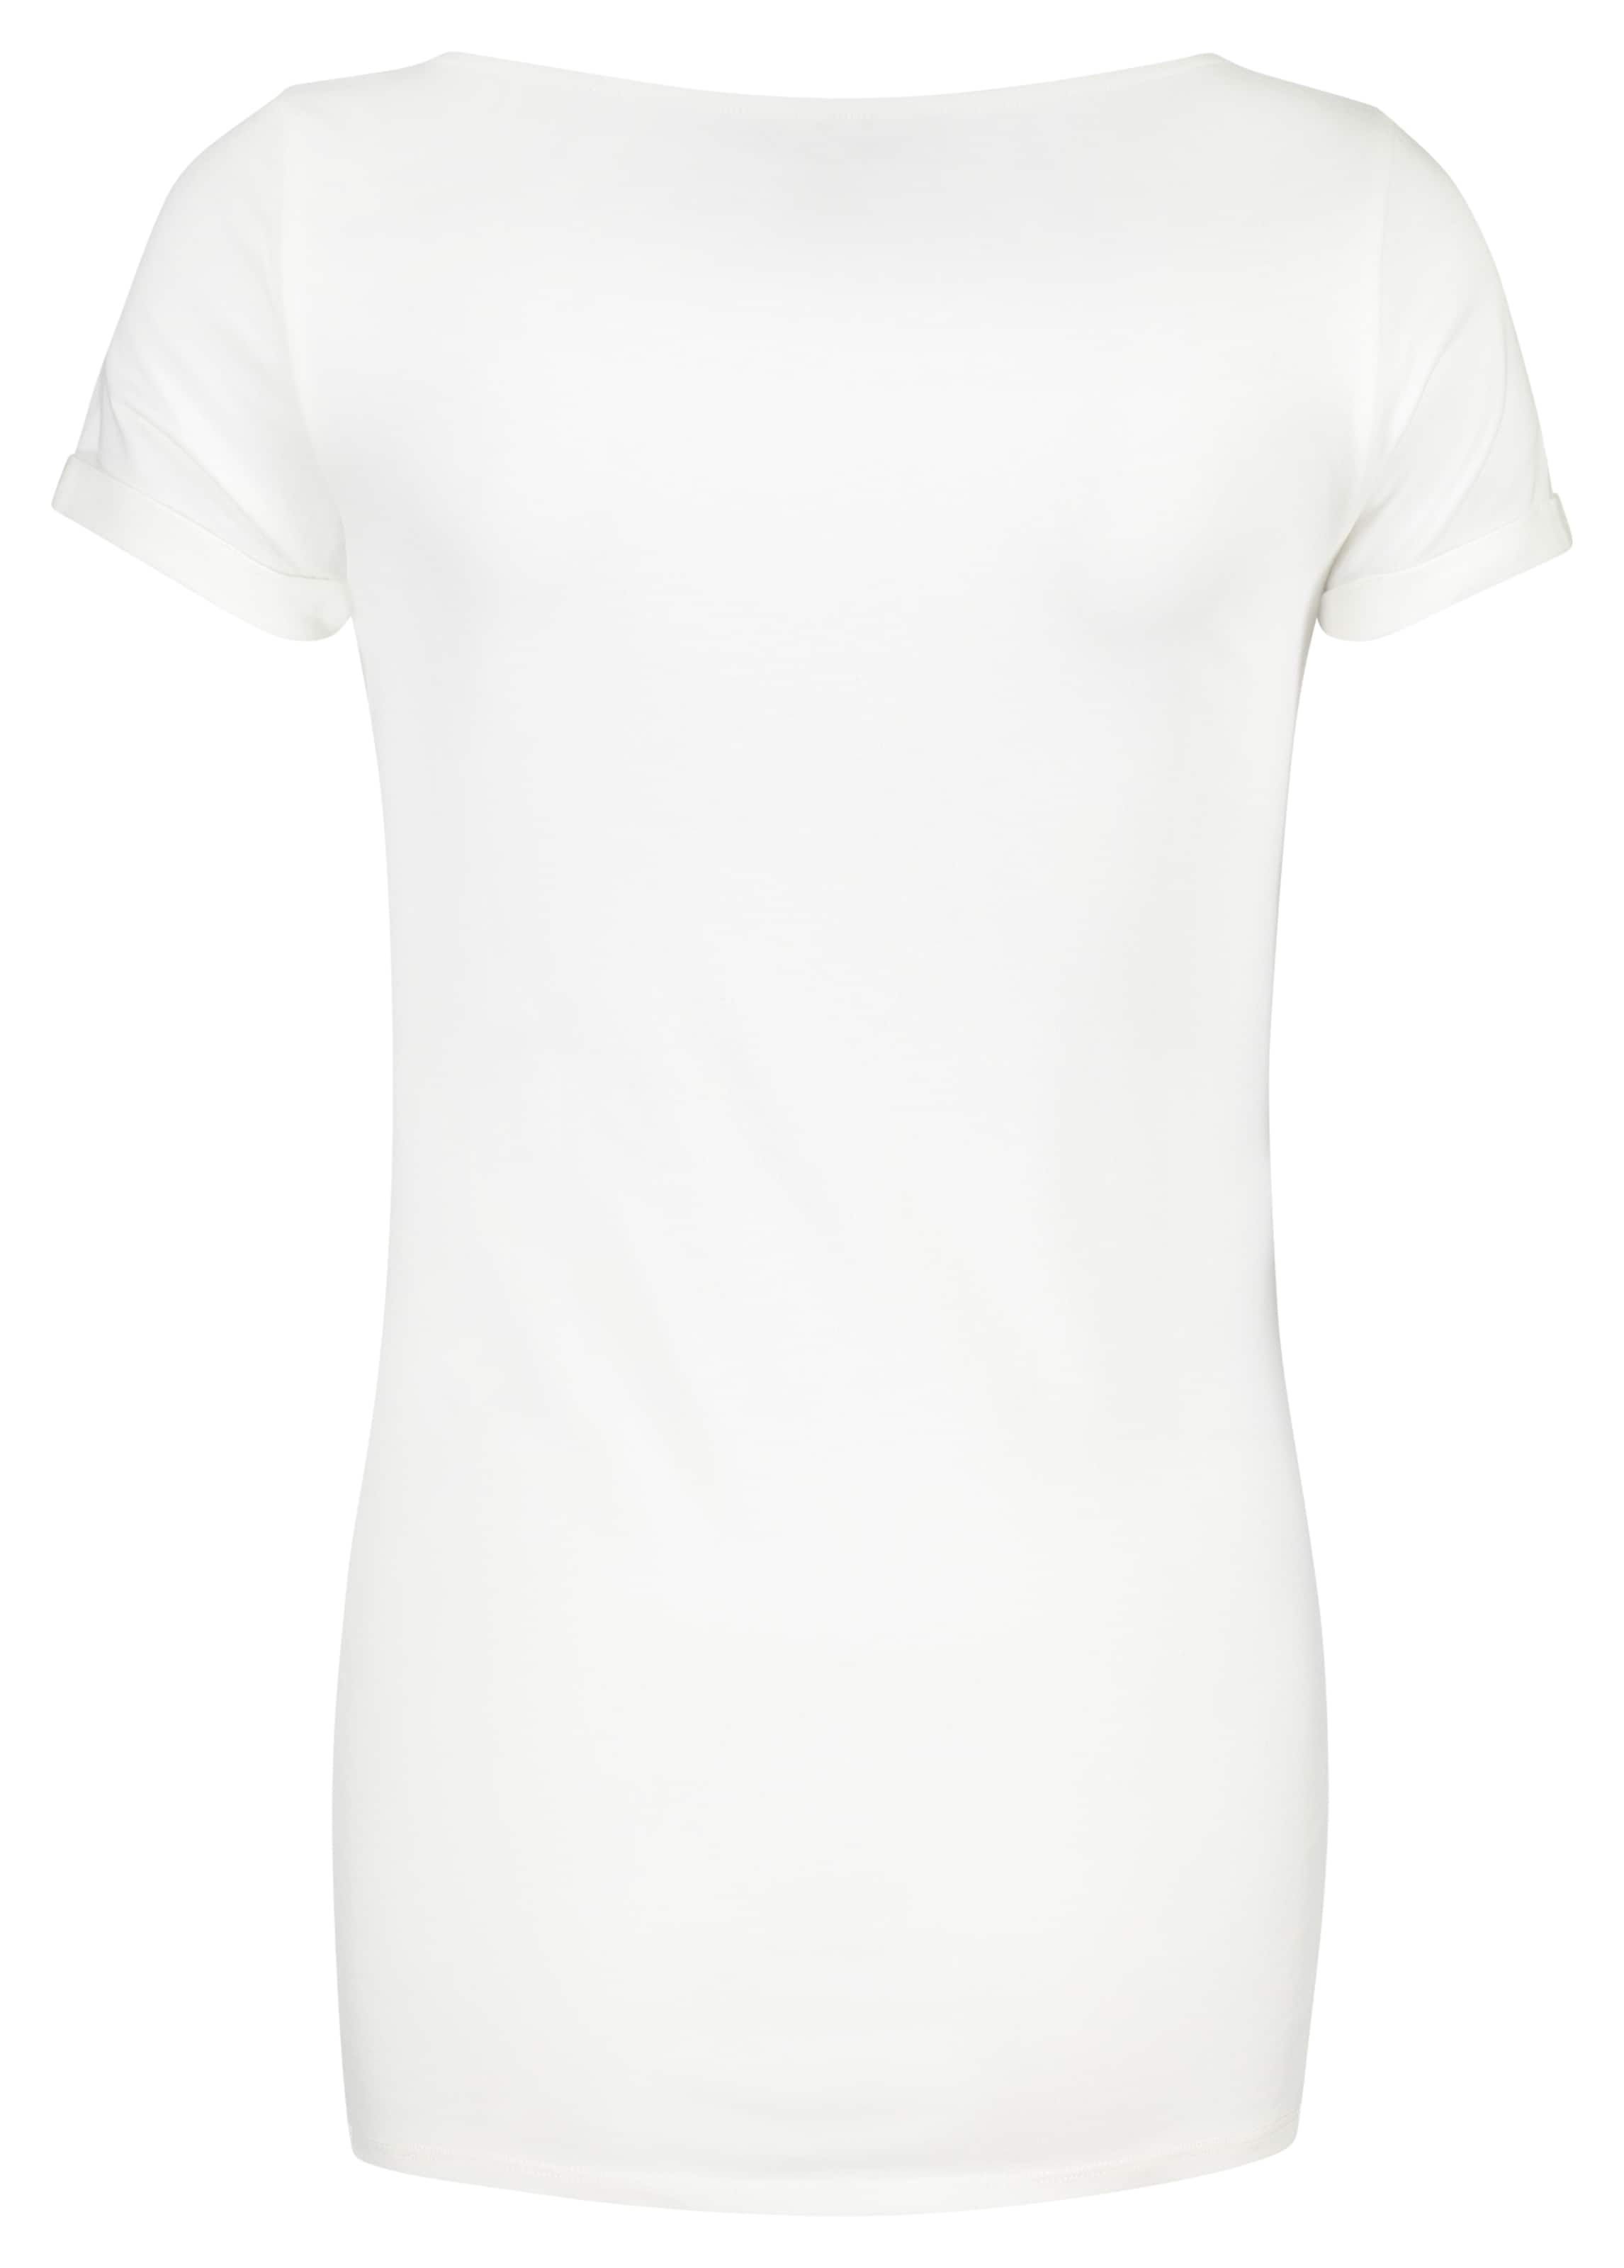 Esprit Maternity Offwhite HellrotSchwarz In shirt T 5qAL34jcR